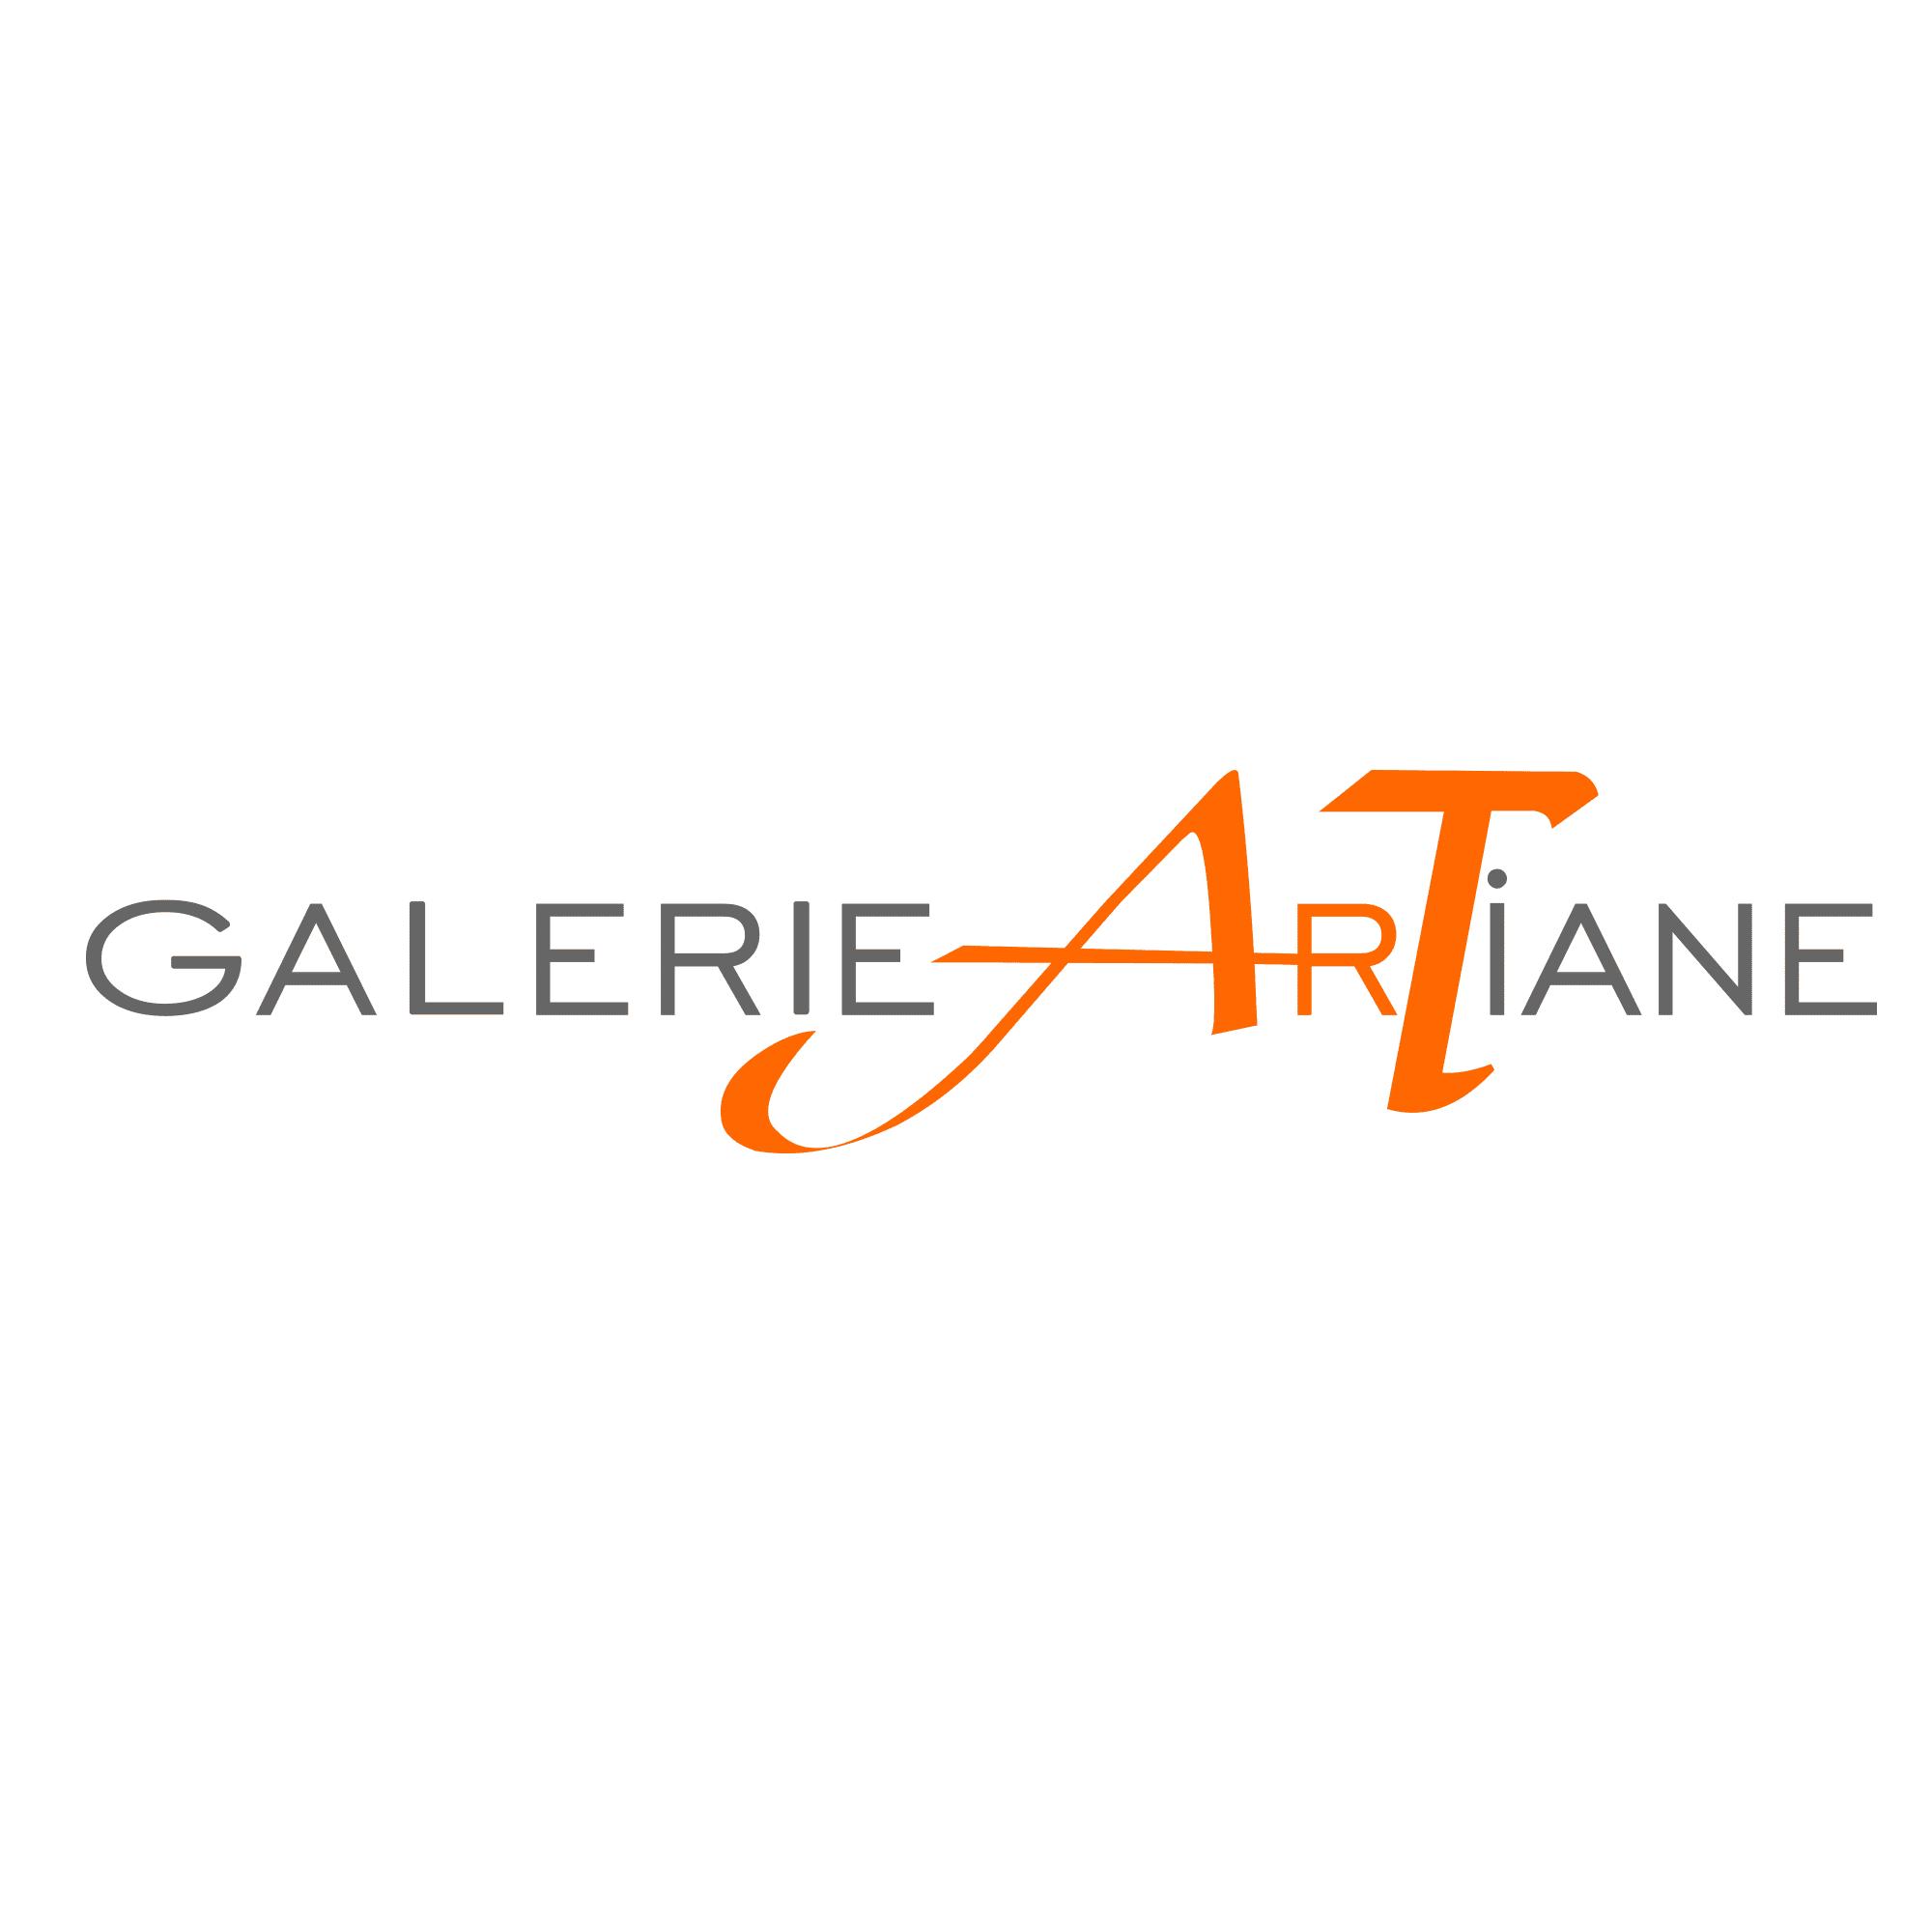 logo galerie artiane honfleur png